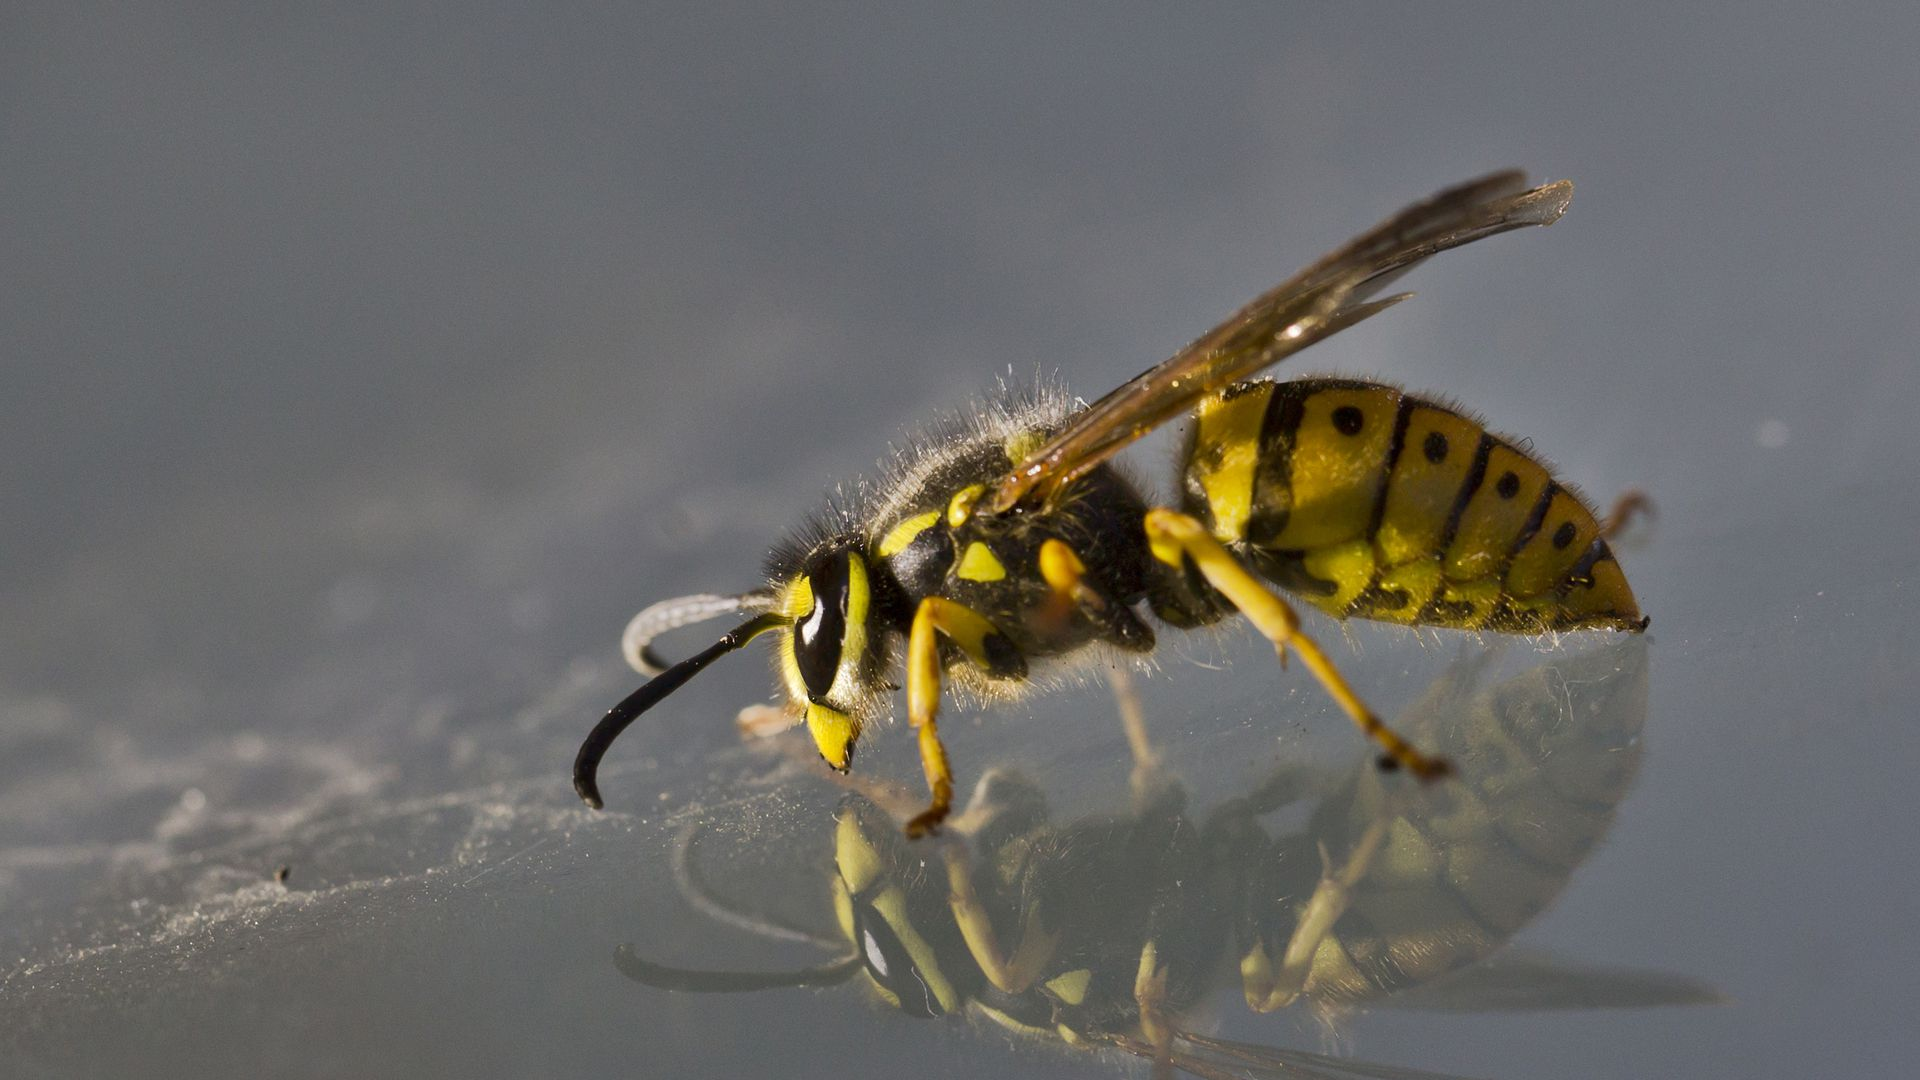 A yellow jacket